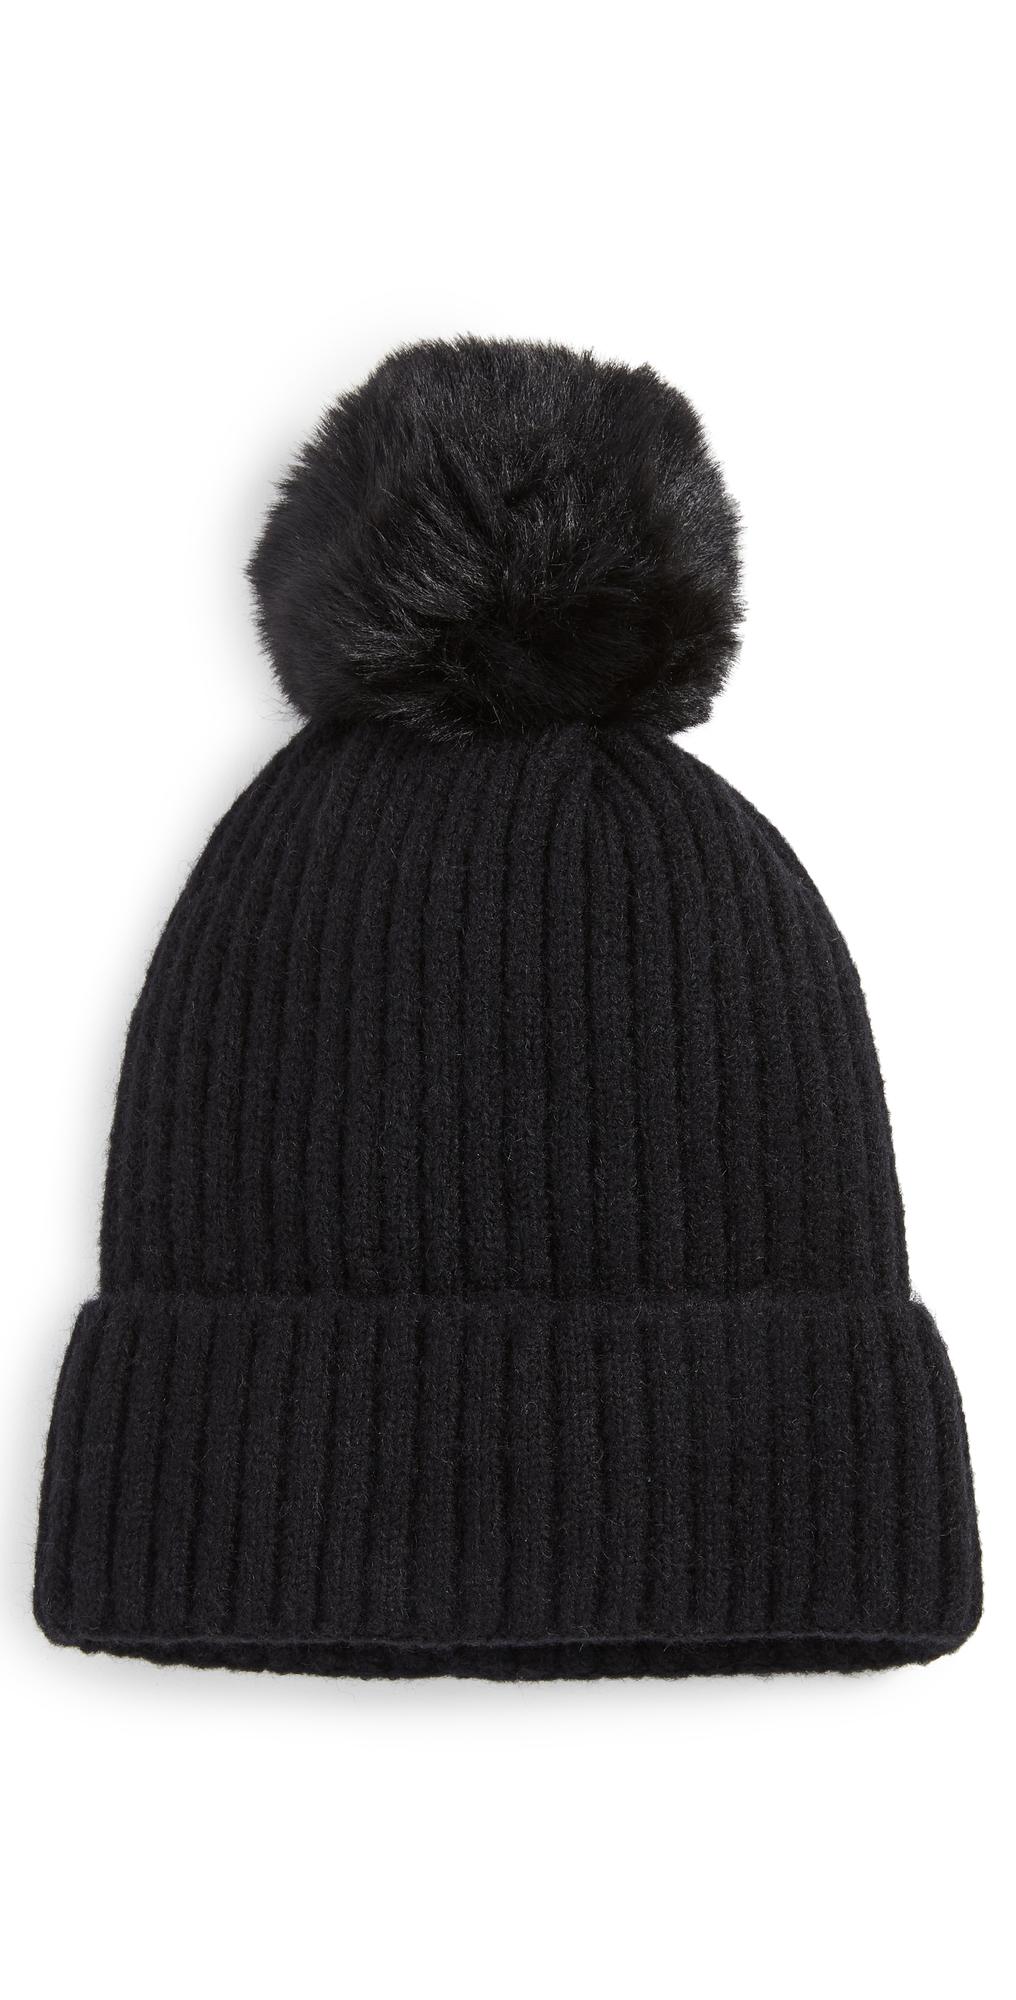 Rib Lined Pom Hat